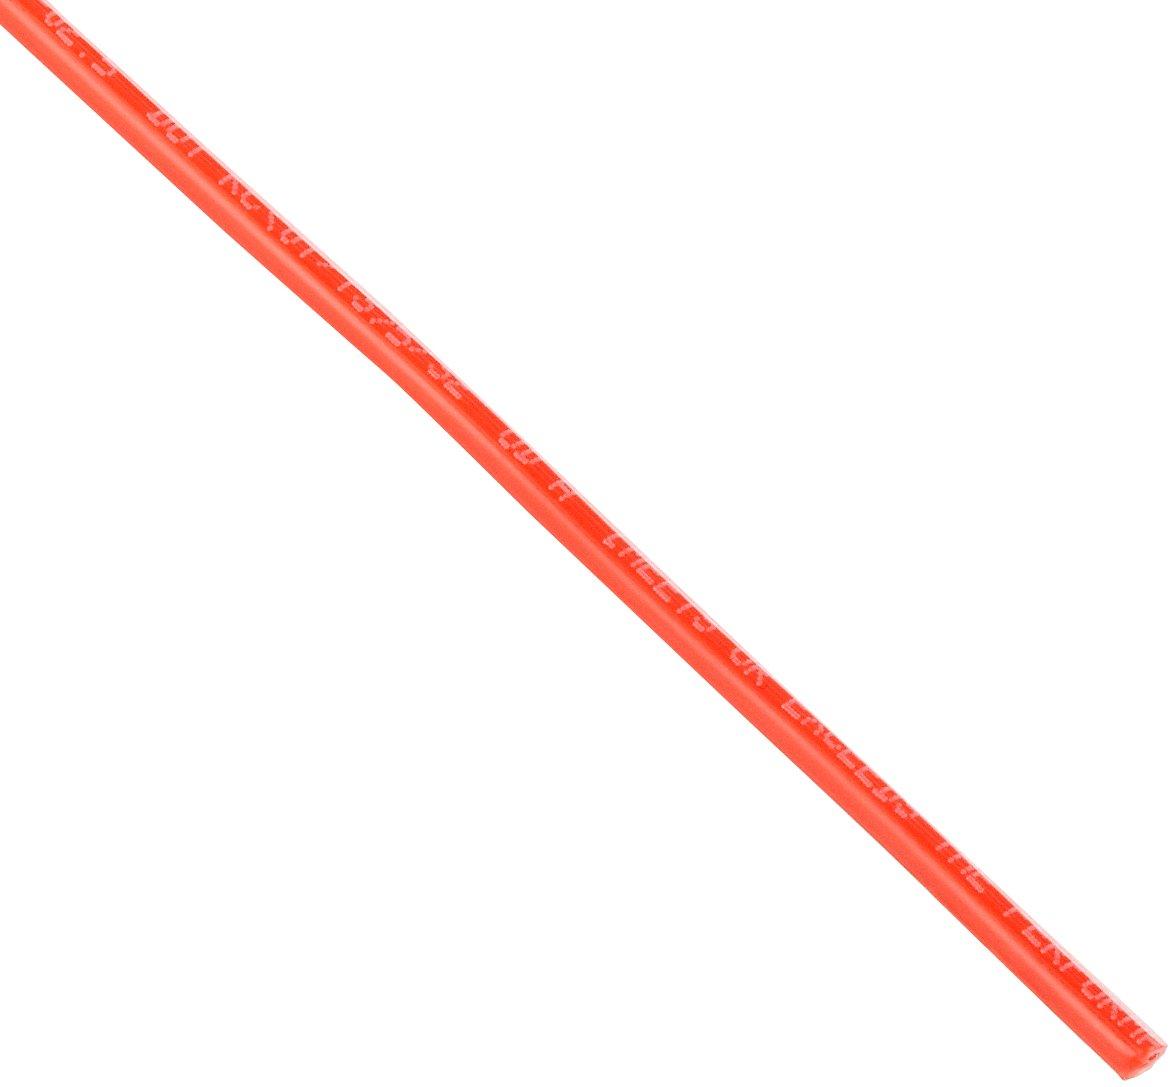 Kuriyama Kuri Tec Polyester, Red, 3/32 inches ID, 5/32 inches OD, 0.032 inches Wall, 1000 feet Length